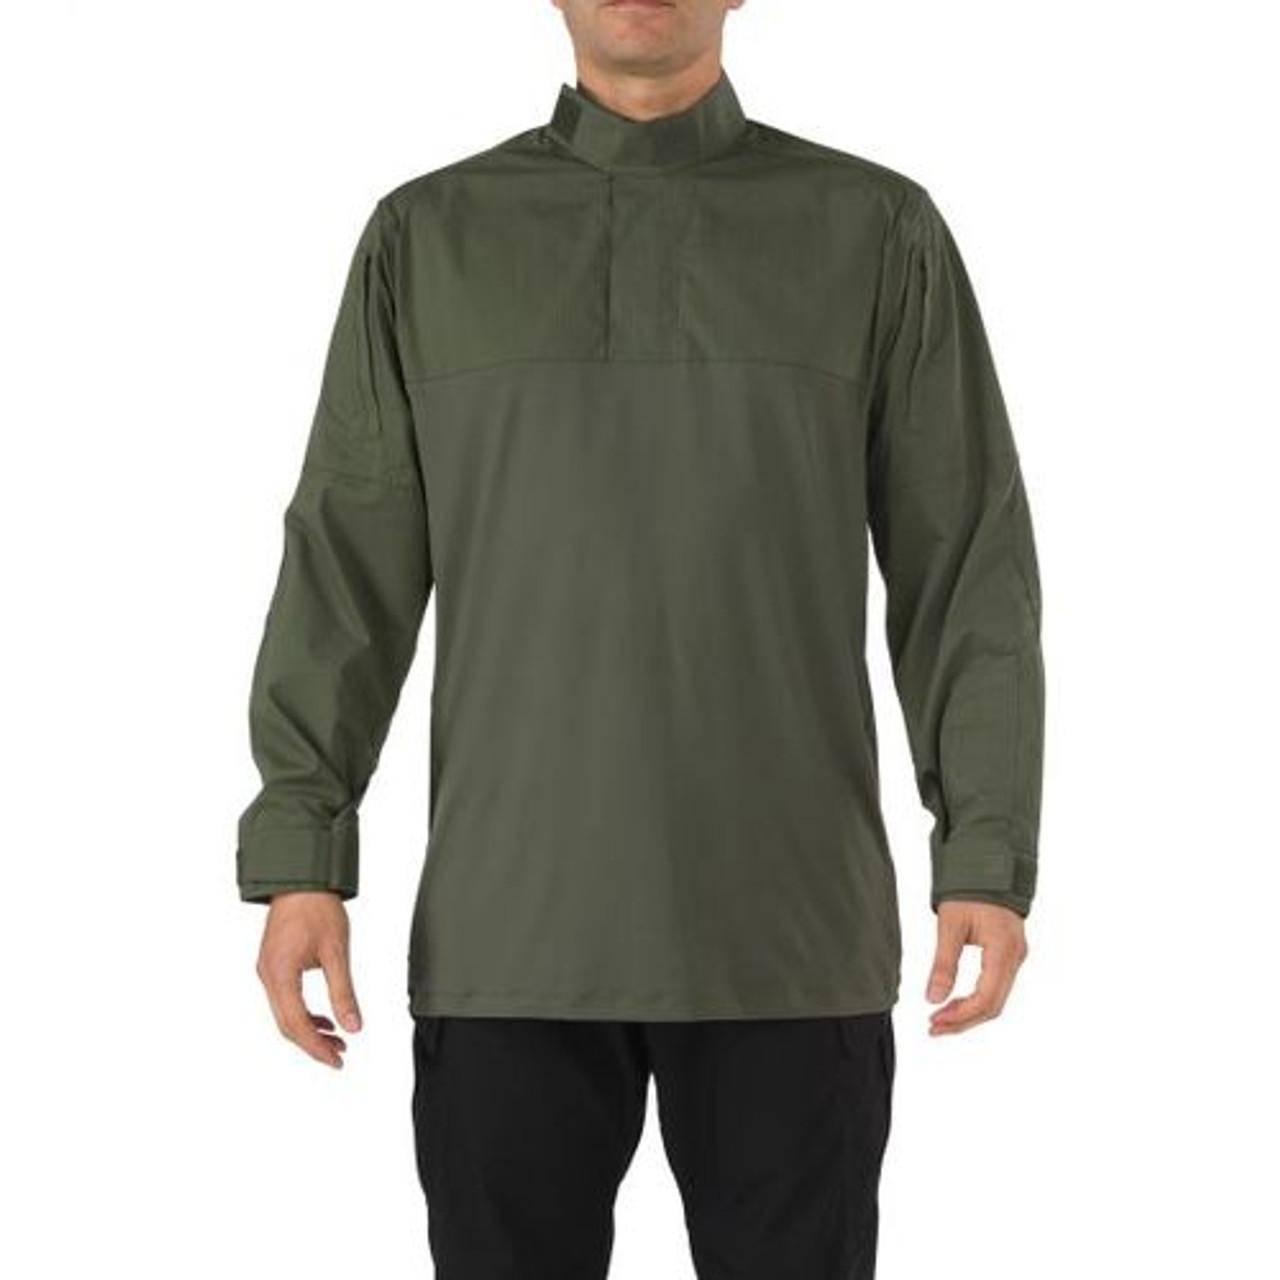 5.11 Tactical MEN'S 5.11 STRYKE® TDU® RAPID LONG SLEEVE SHIRT, 1/4 Zip, 87% polyester / 13% Spandex, Badge tab and epaulette kit, Regular Fit, Sleeve Pocket, 72071